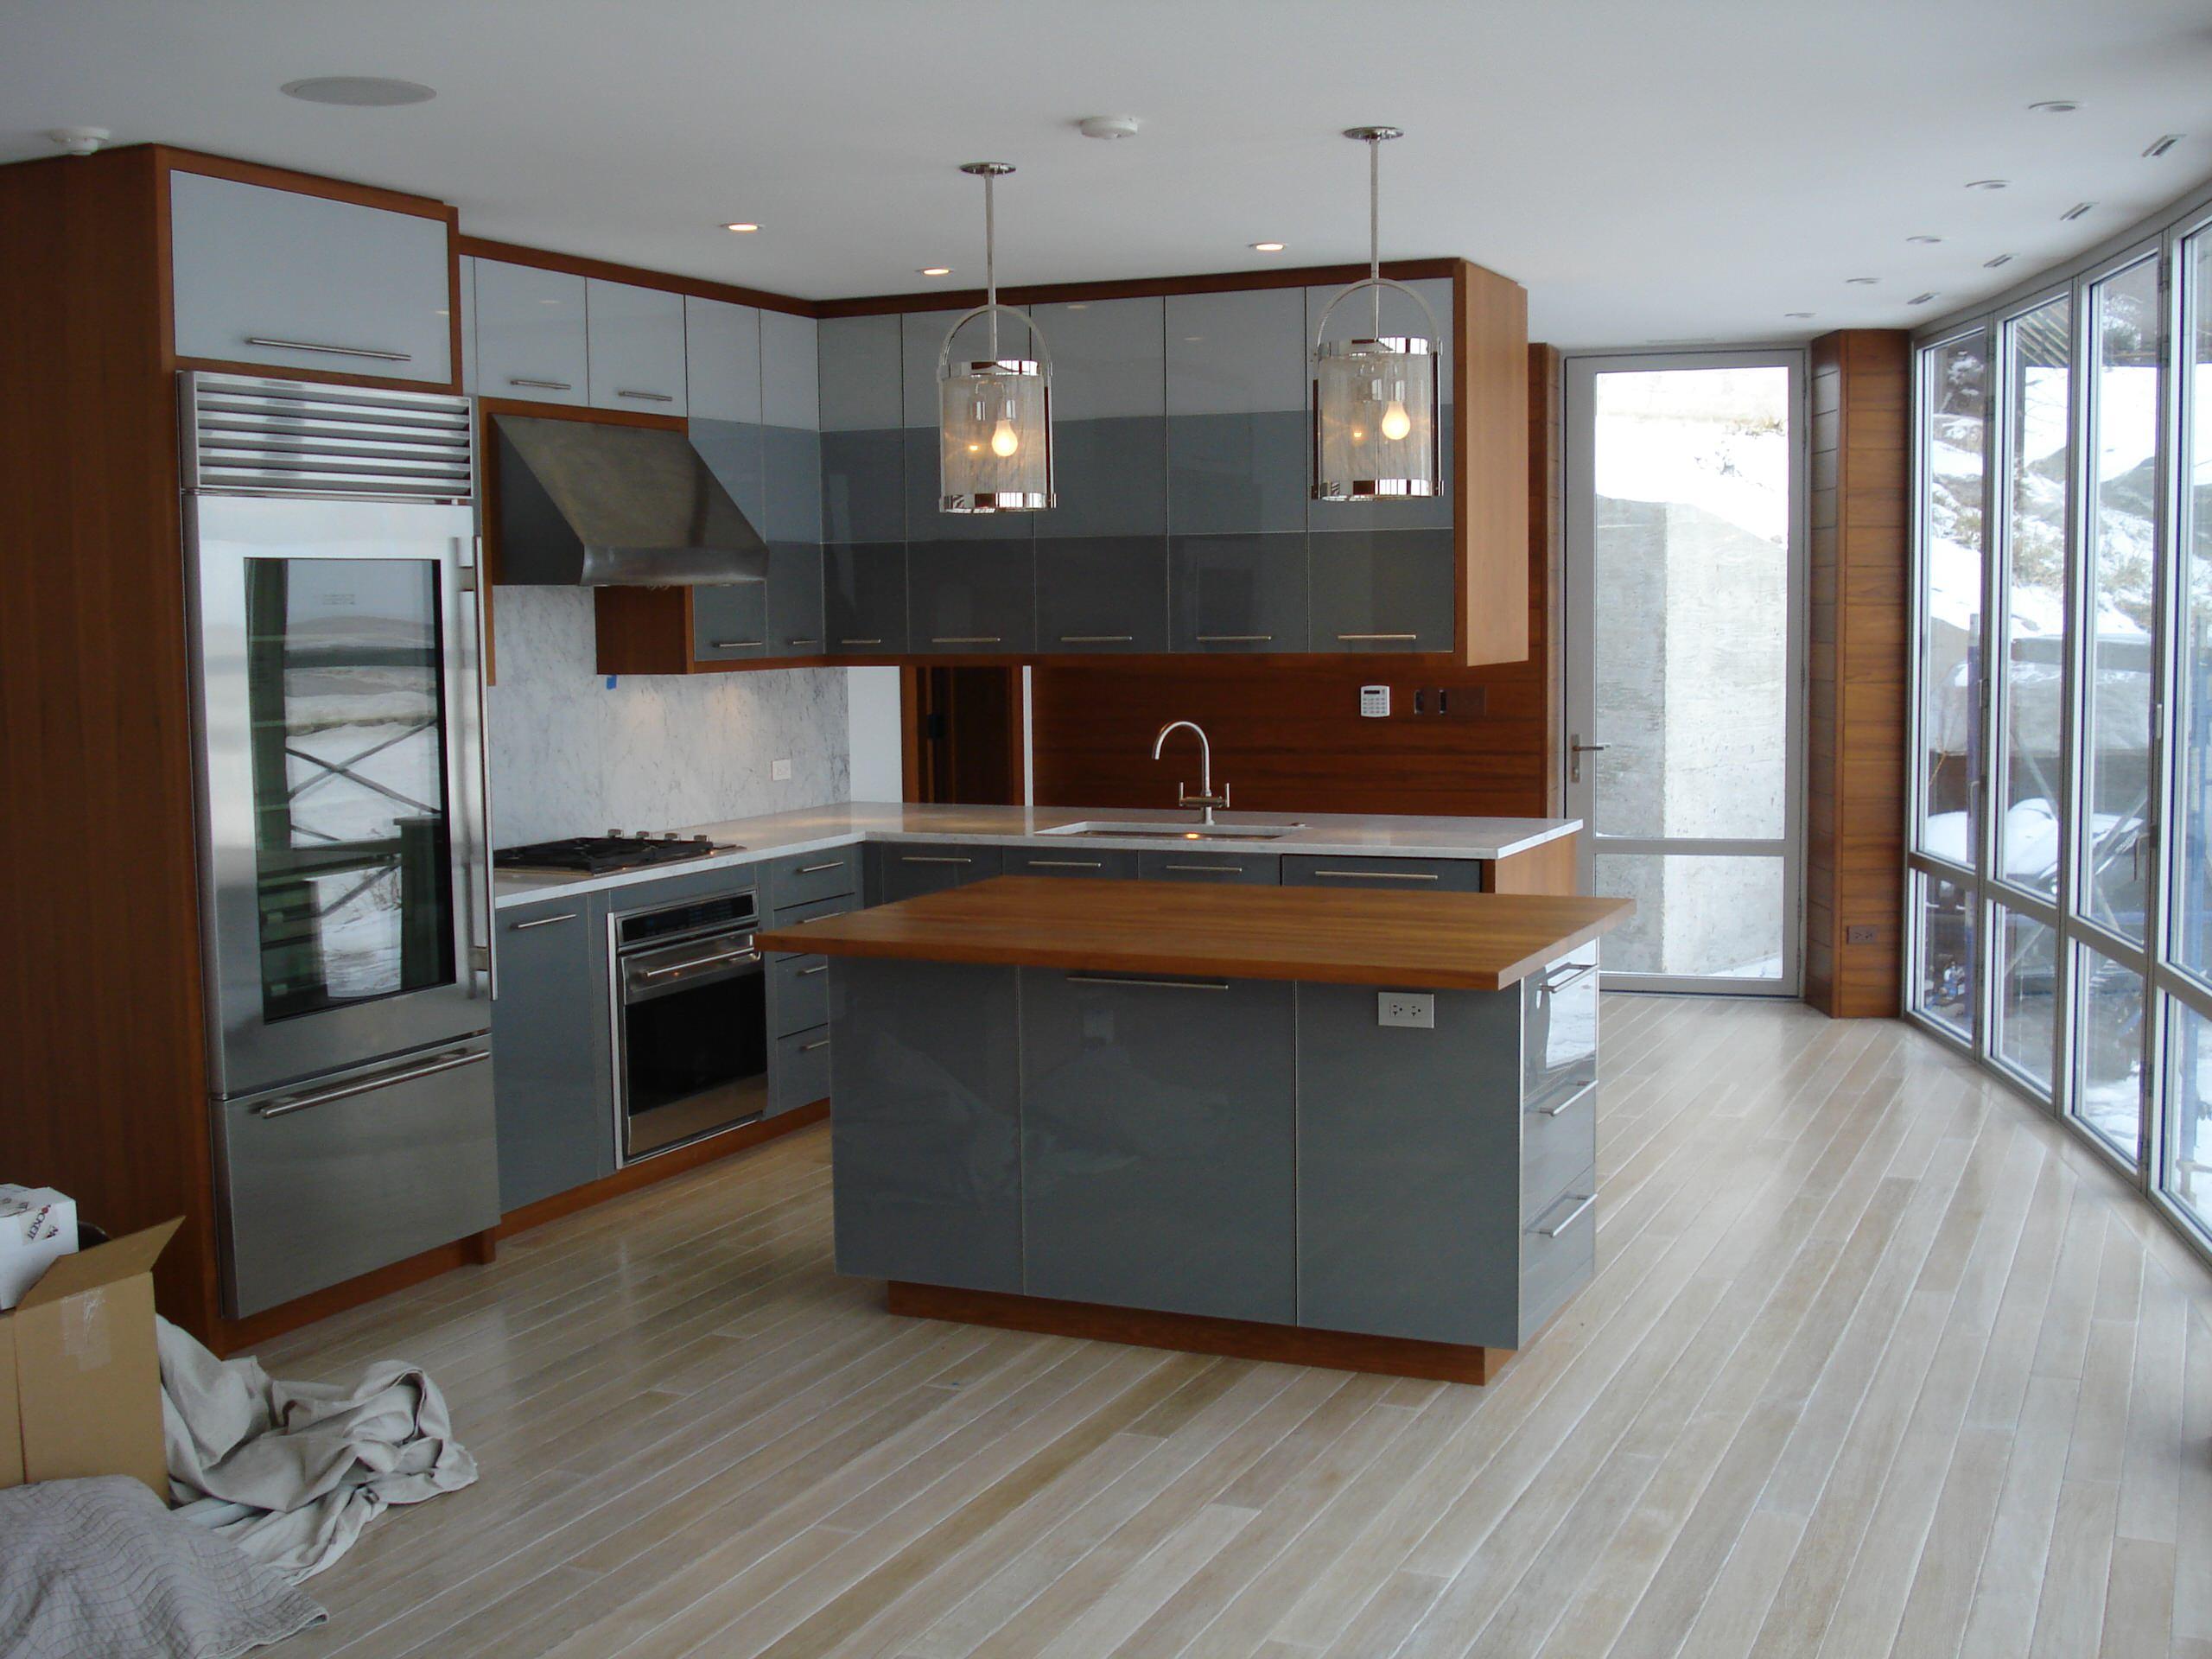 Glass & Teak Cabinets